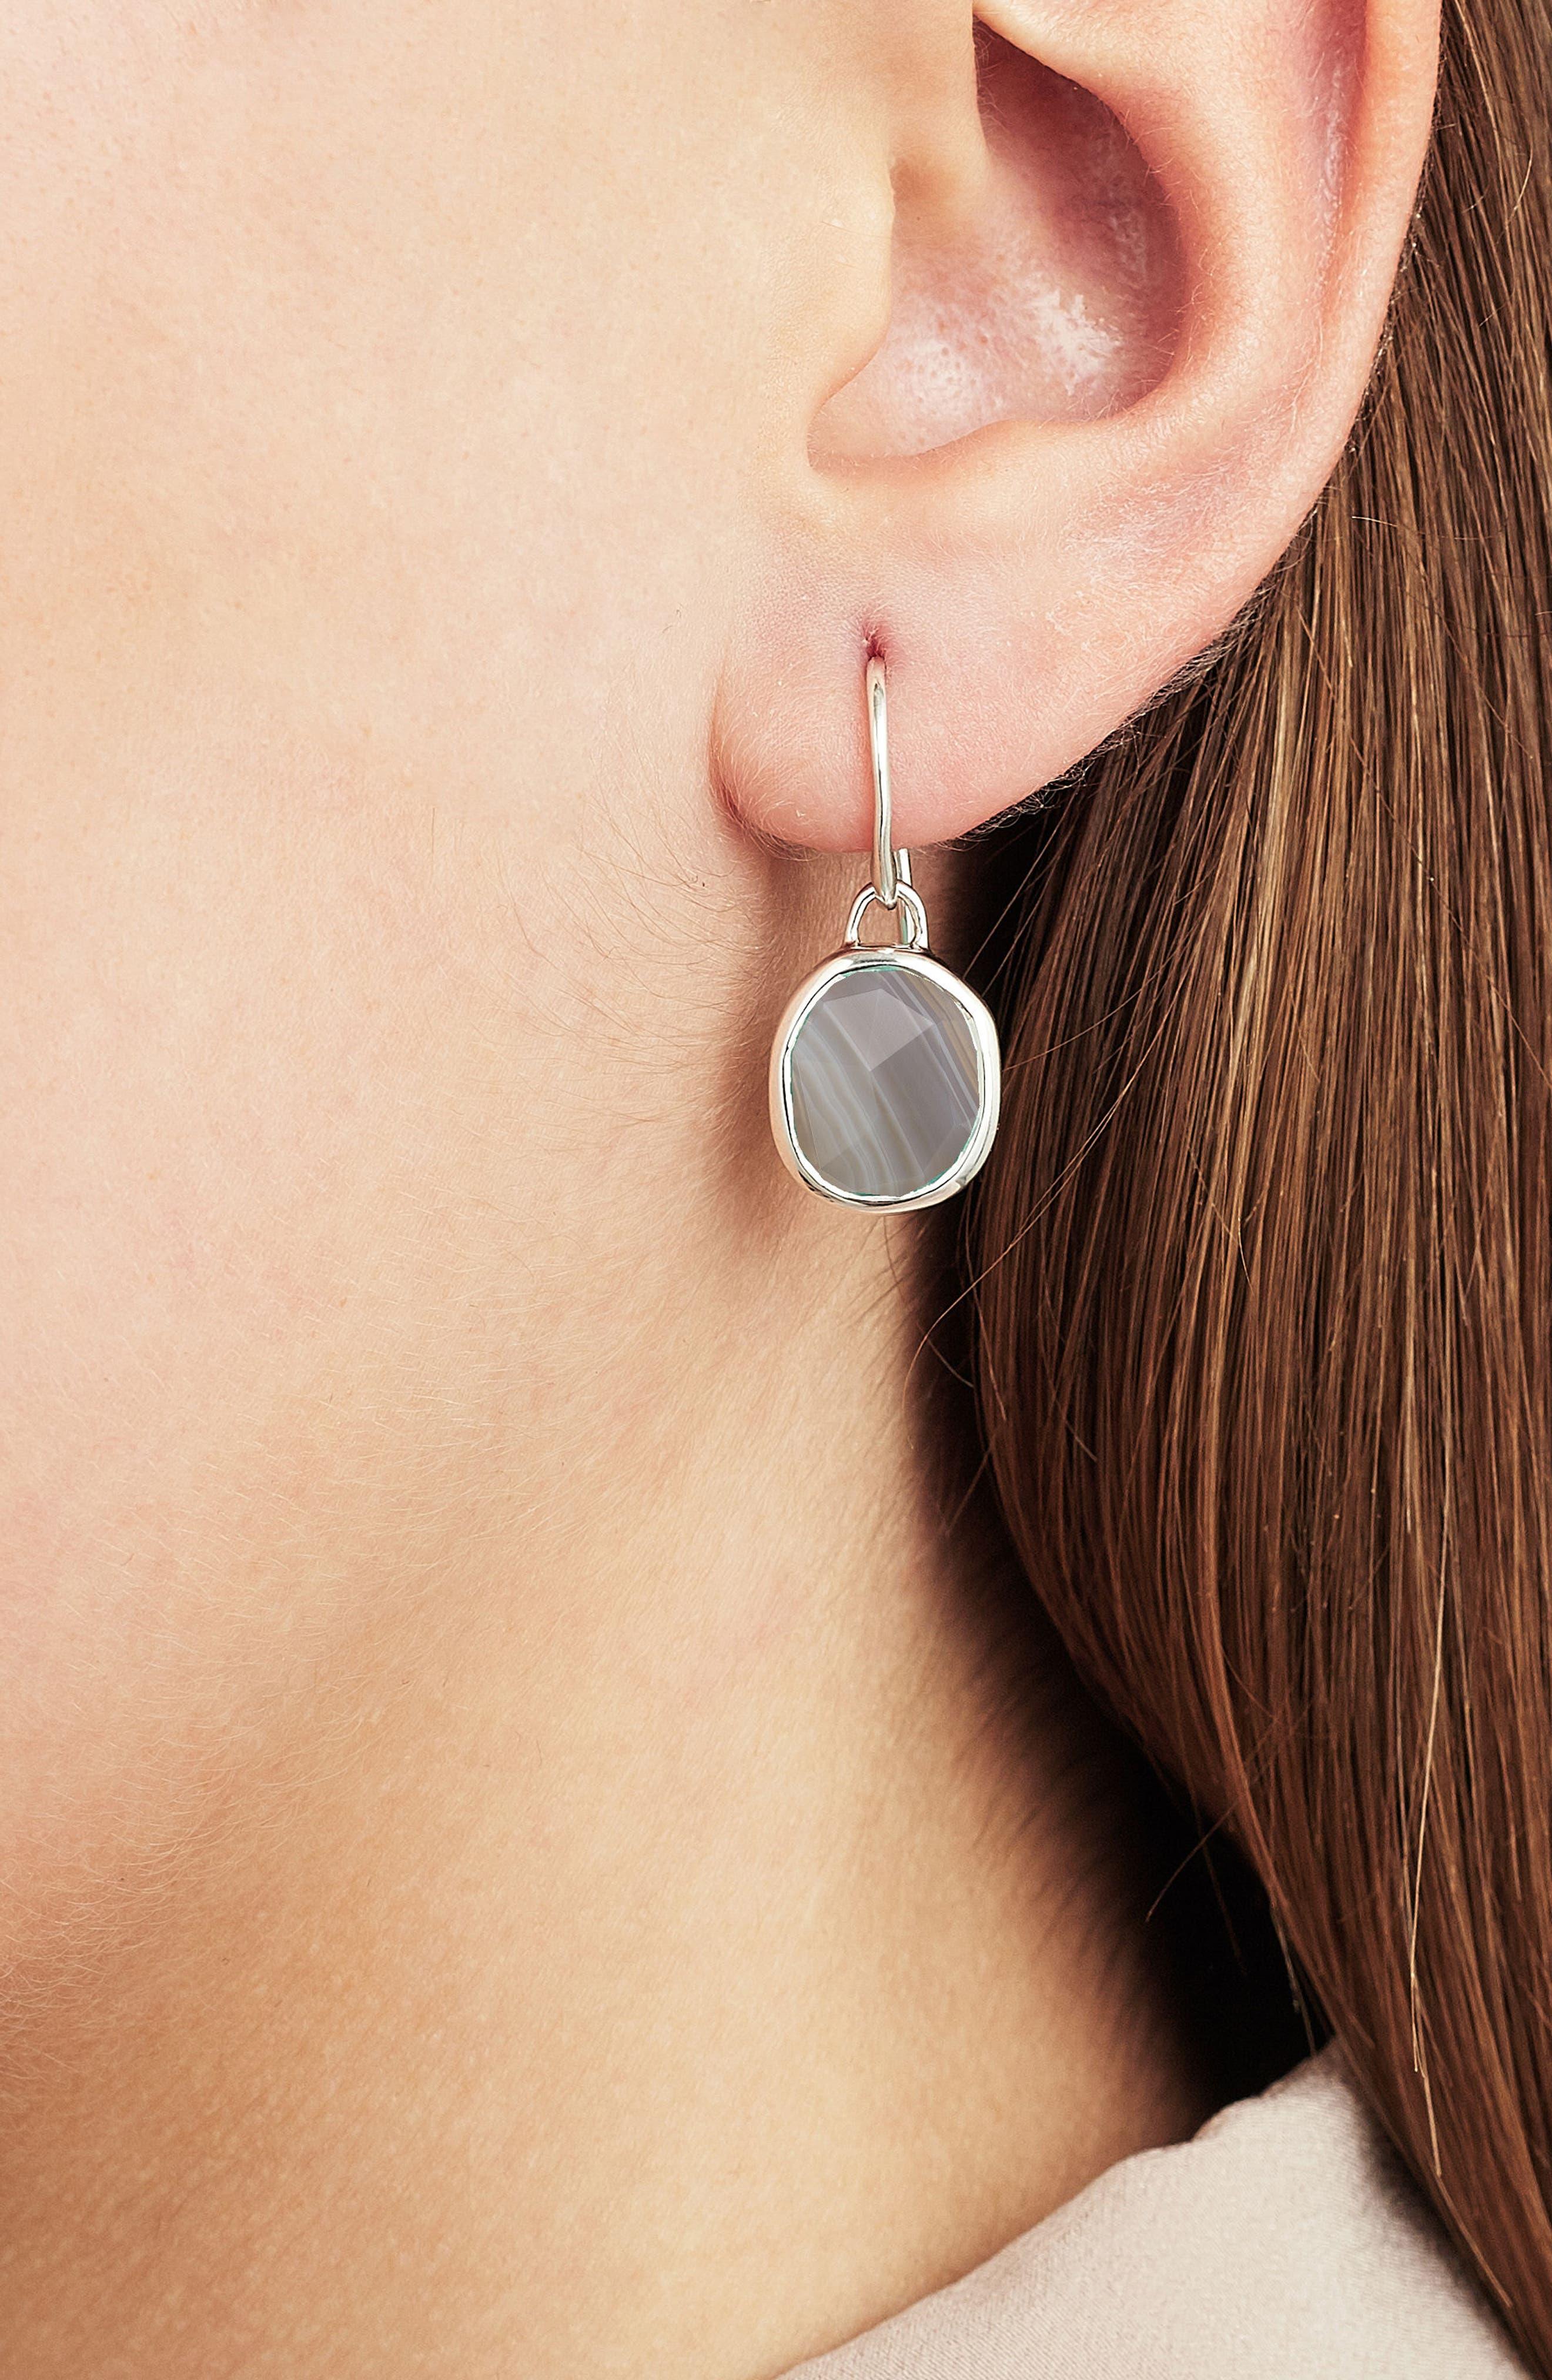 Siren Semiprecious Stone Drop Earrings,                             Alternate thumbnail 2, color,                             SILVER/ GREY AGATE